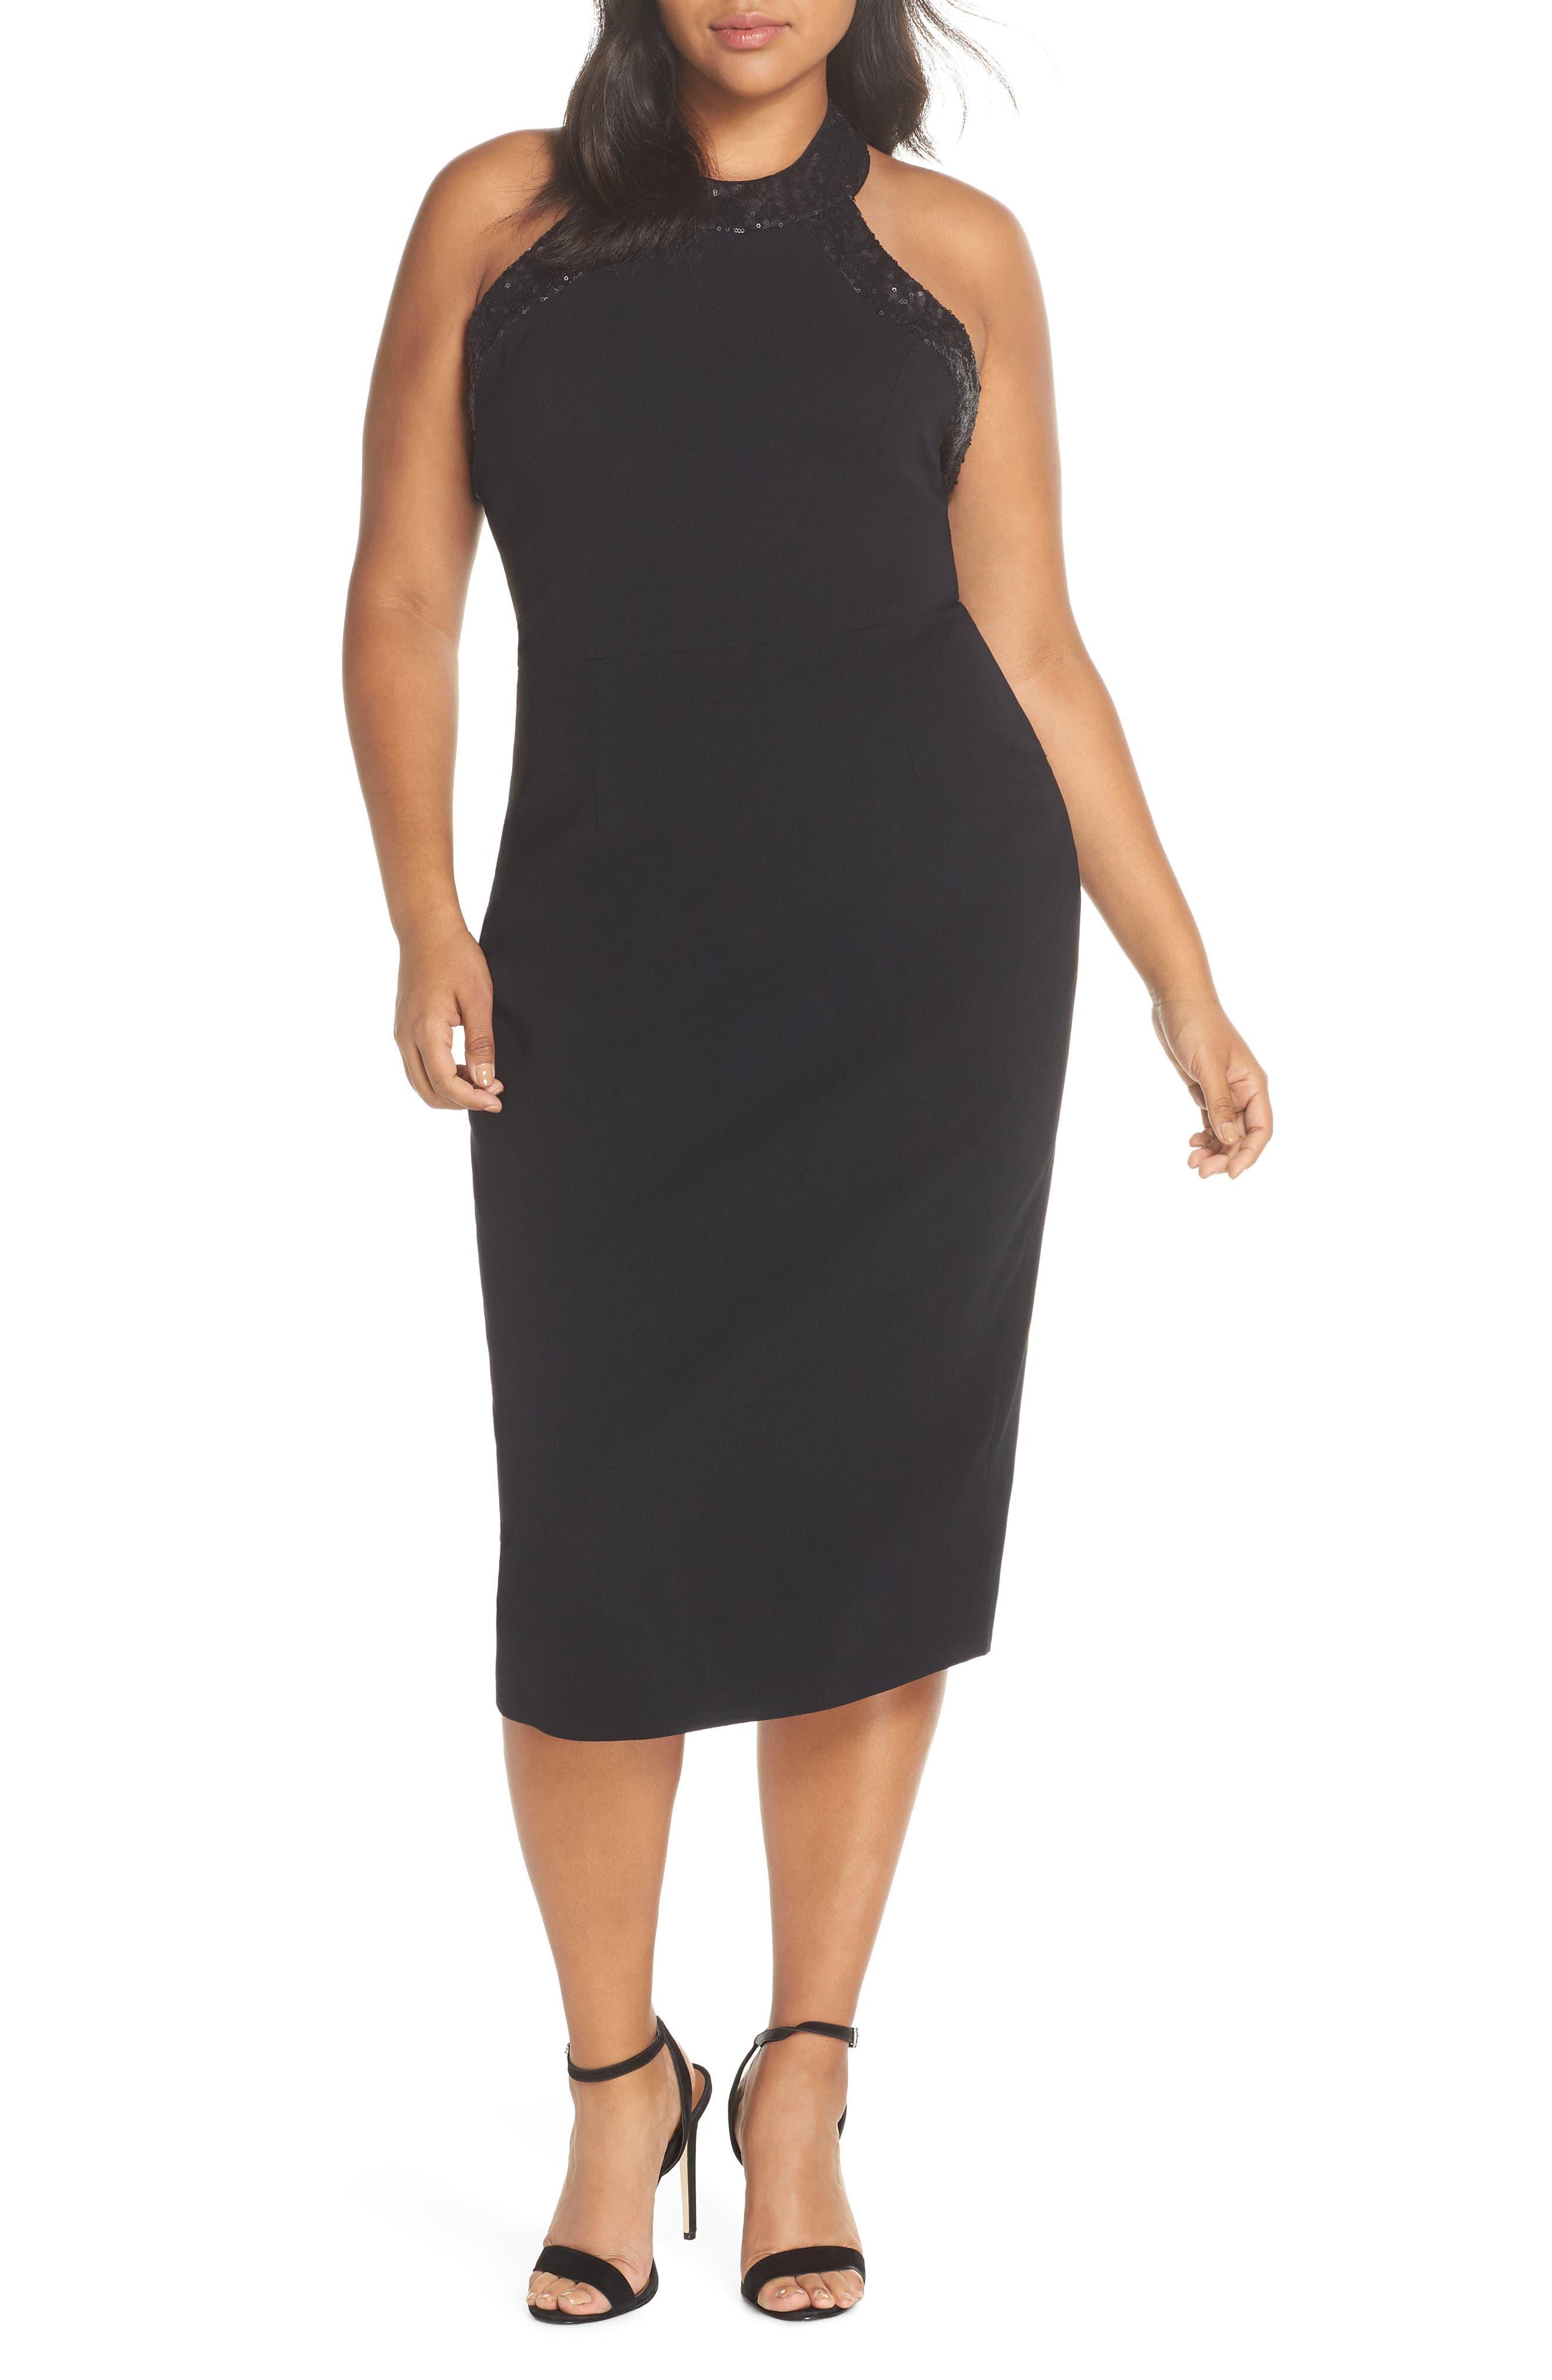 Cleo Halter Dress,                             Alternate thumbnail 2, color,                             BLACK/ BLACK